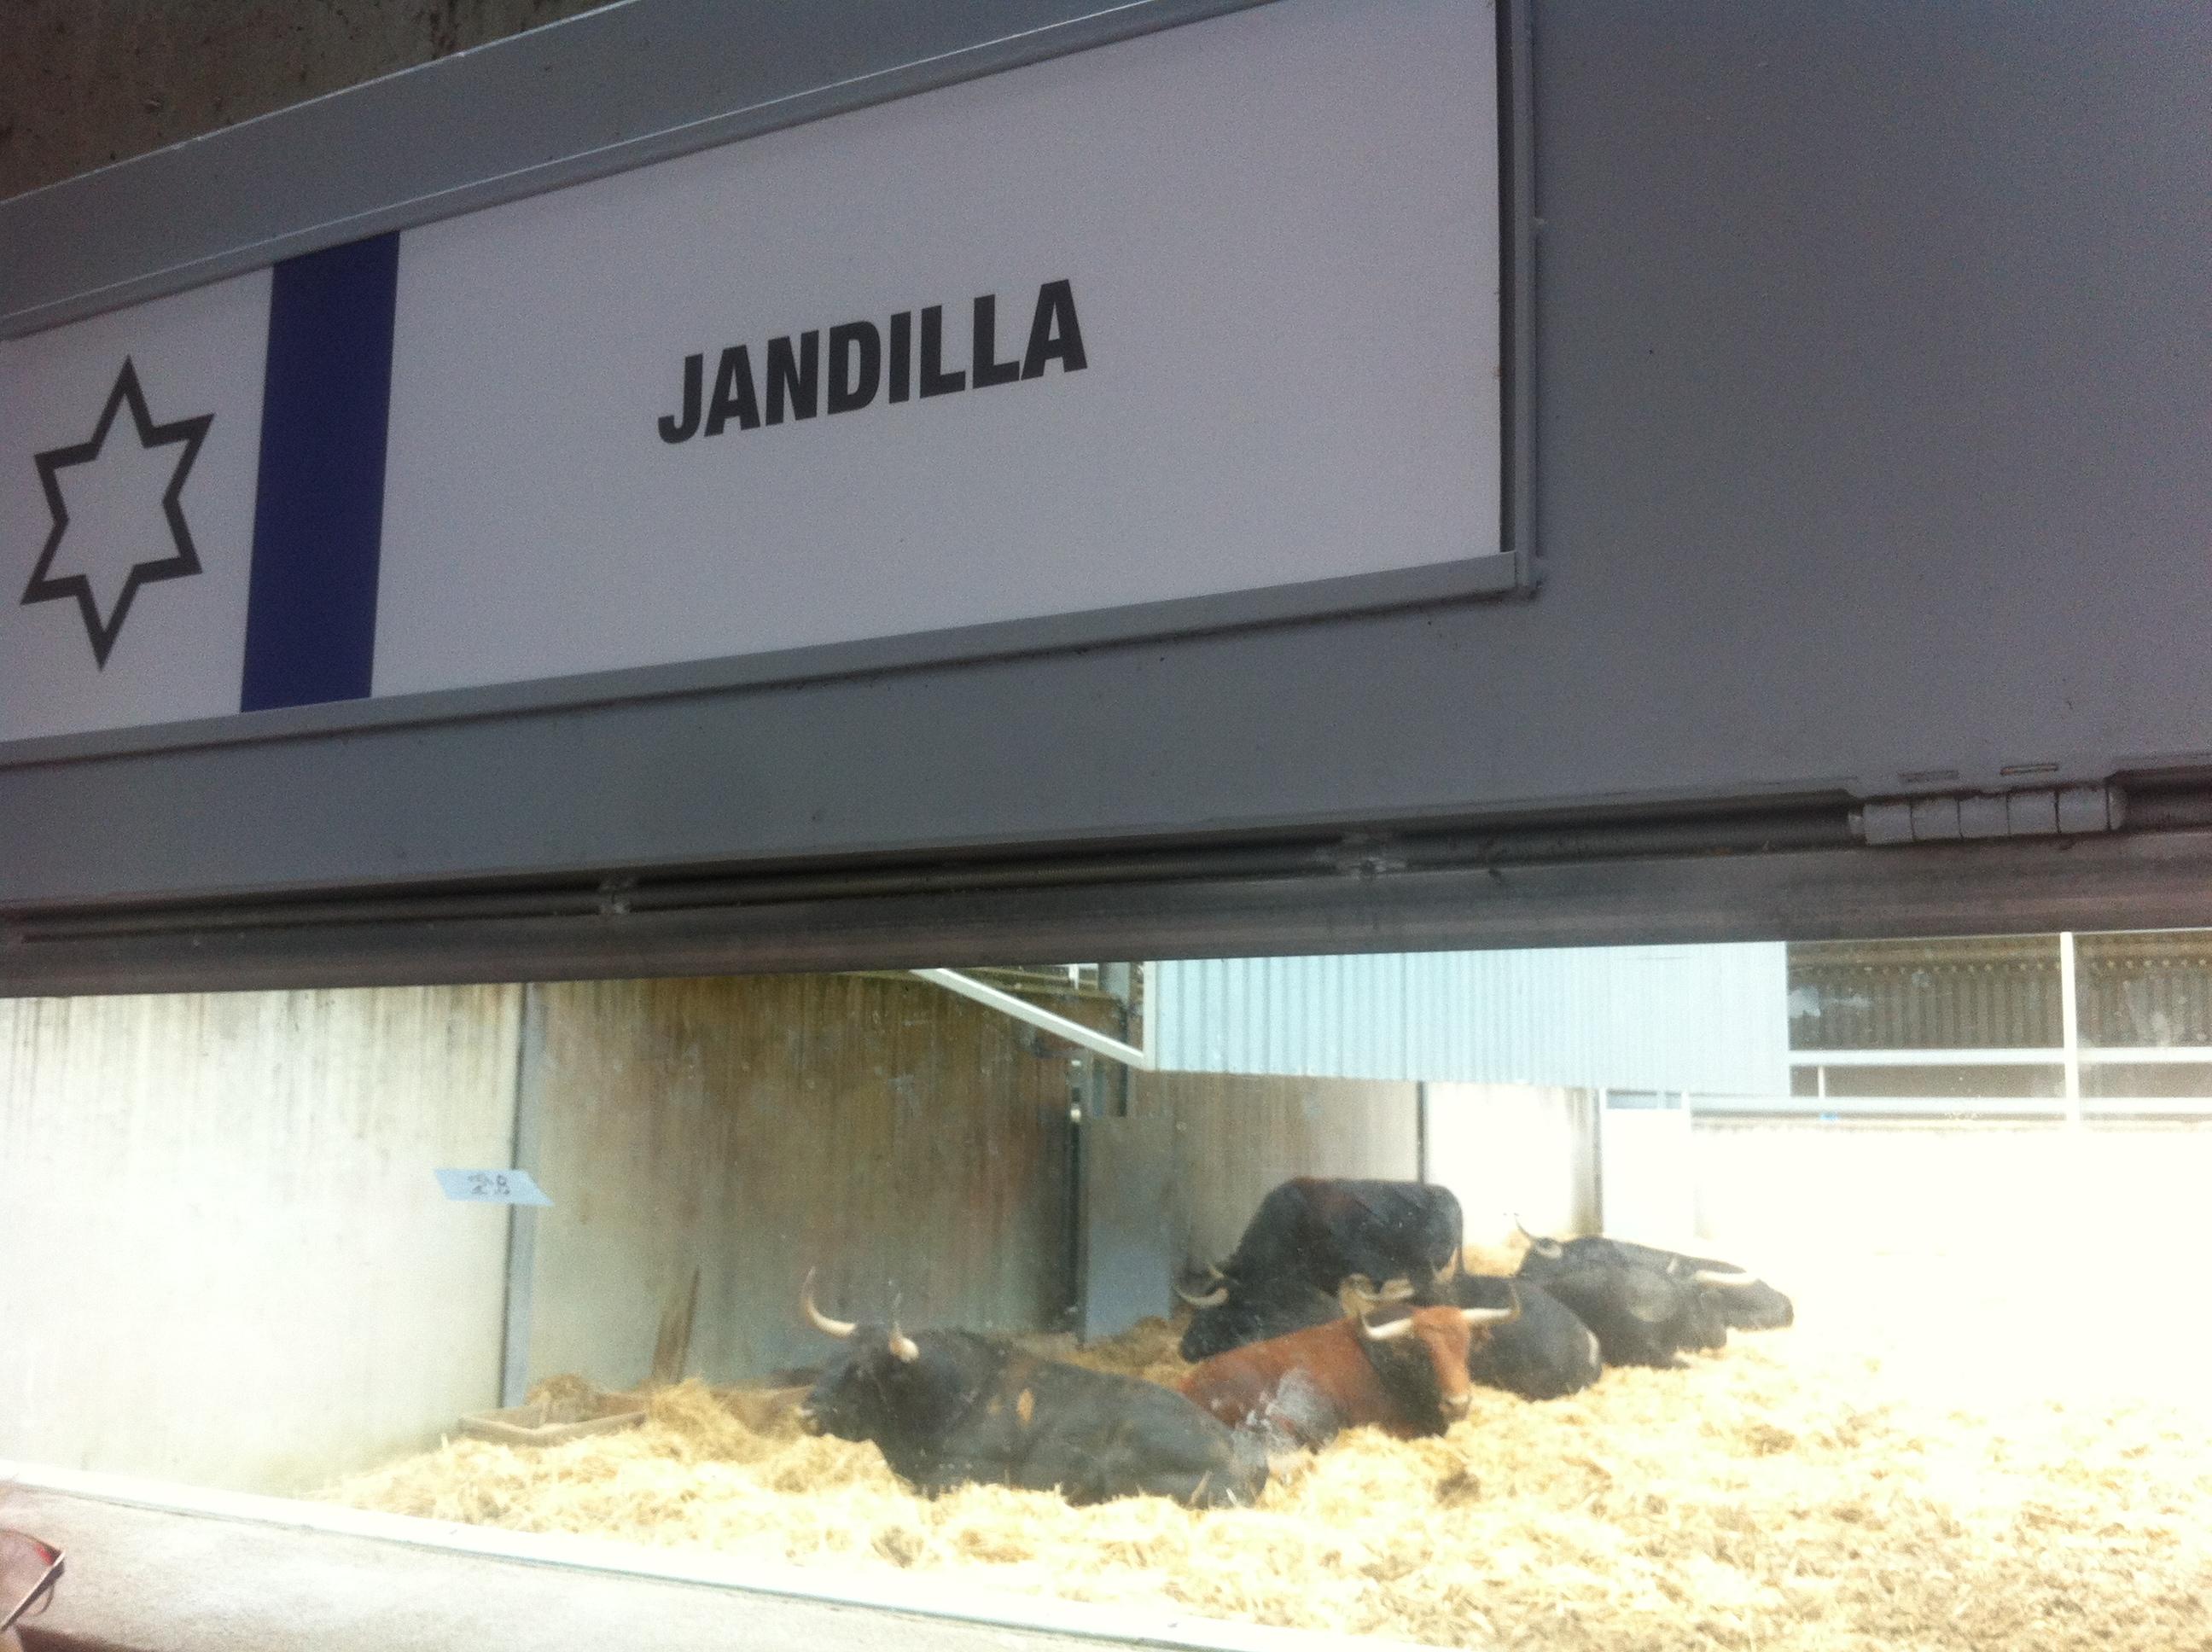 san-fermin-pamplona-visite-ganaderia-jandilla-pampelune-le-cercle